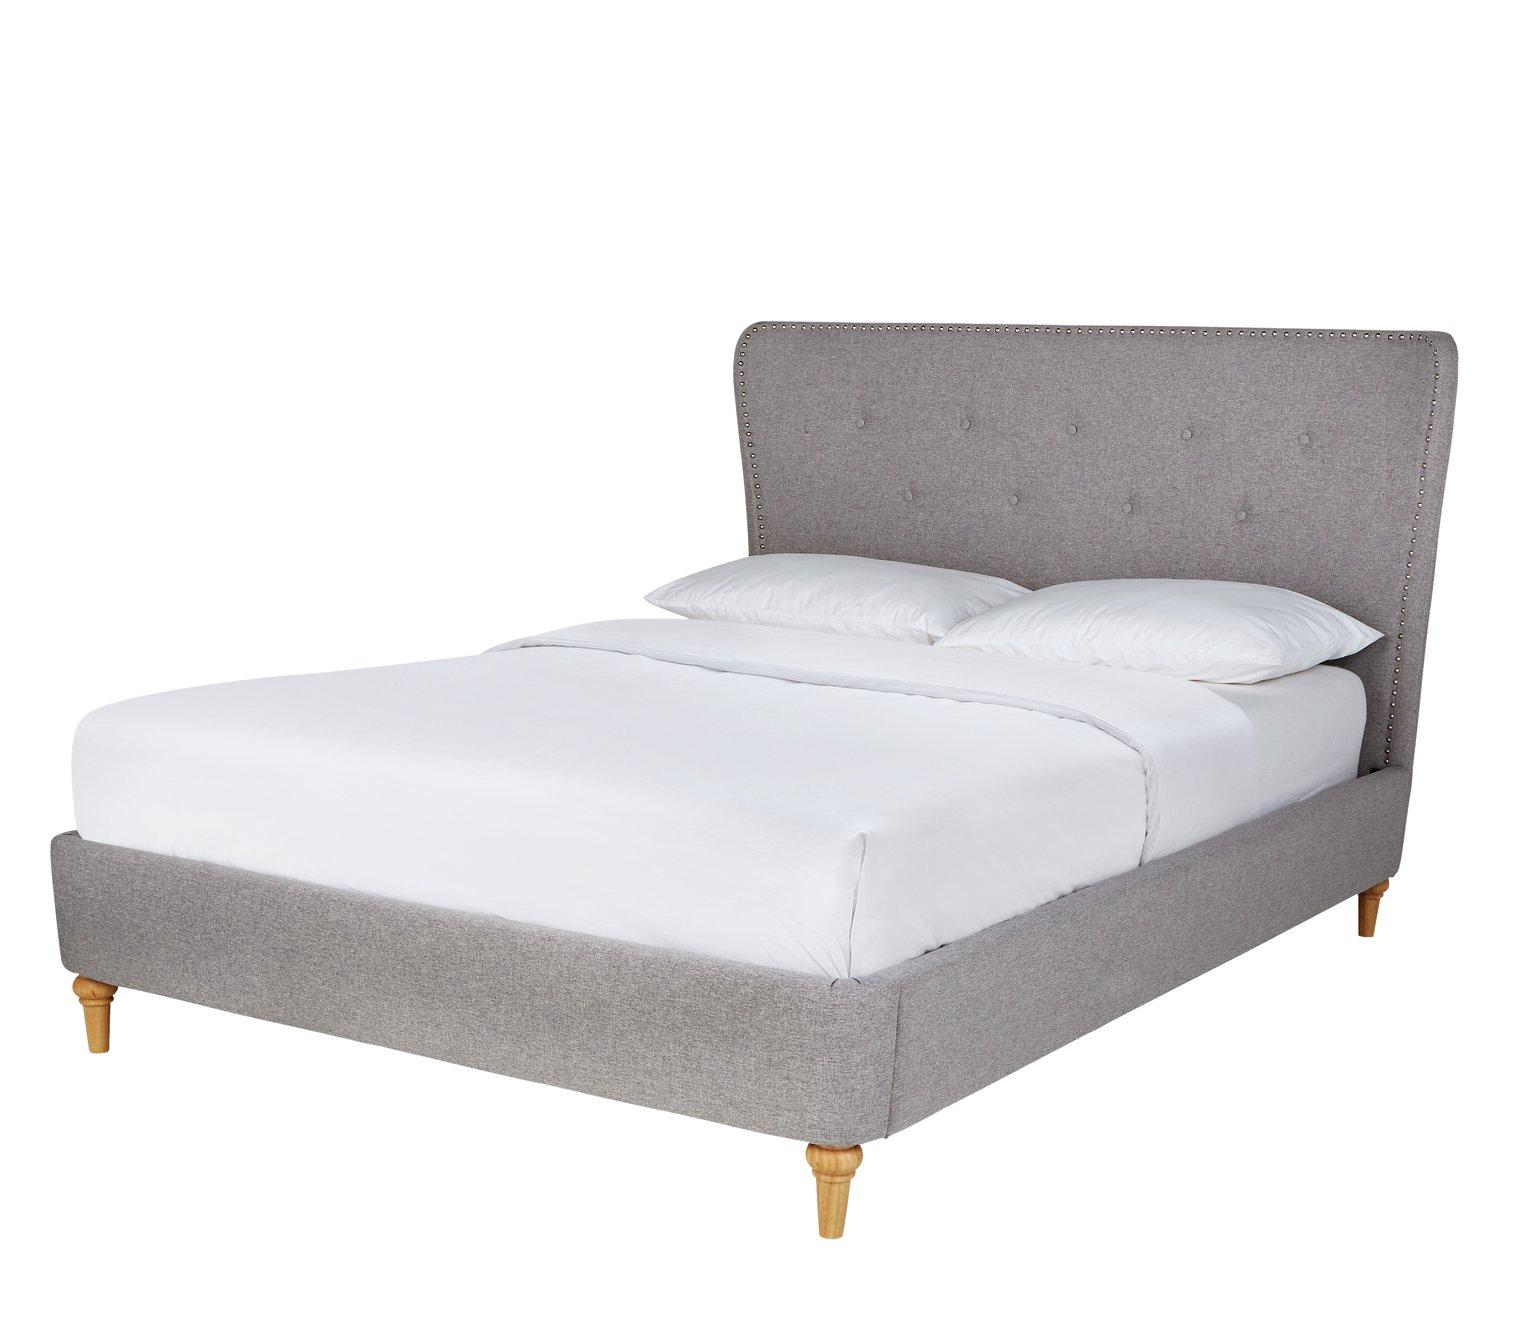 Argos Home Elizabeth Double Bed Frame - Grey